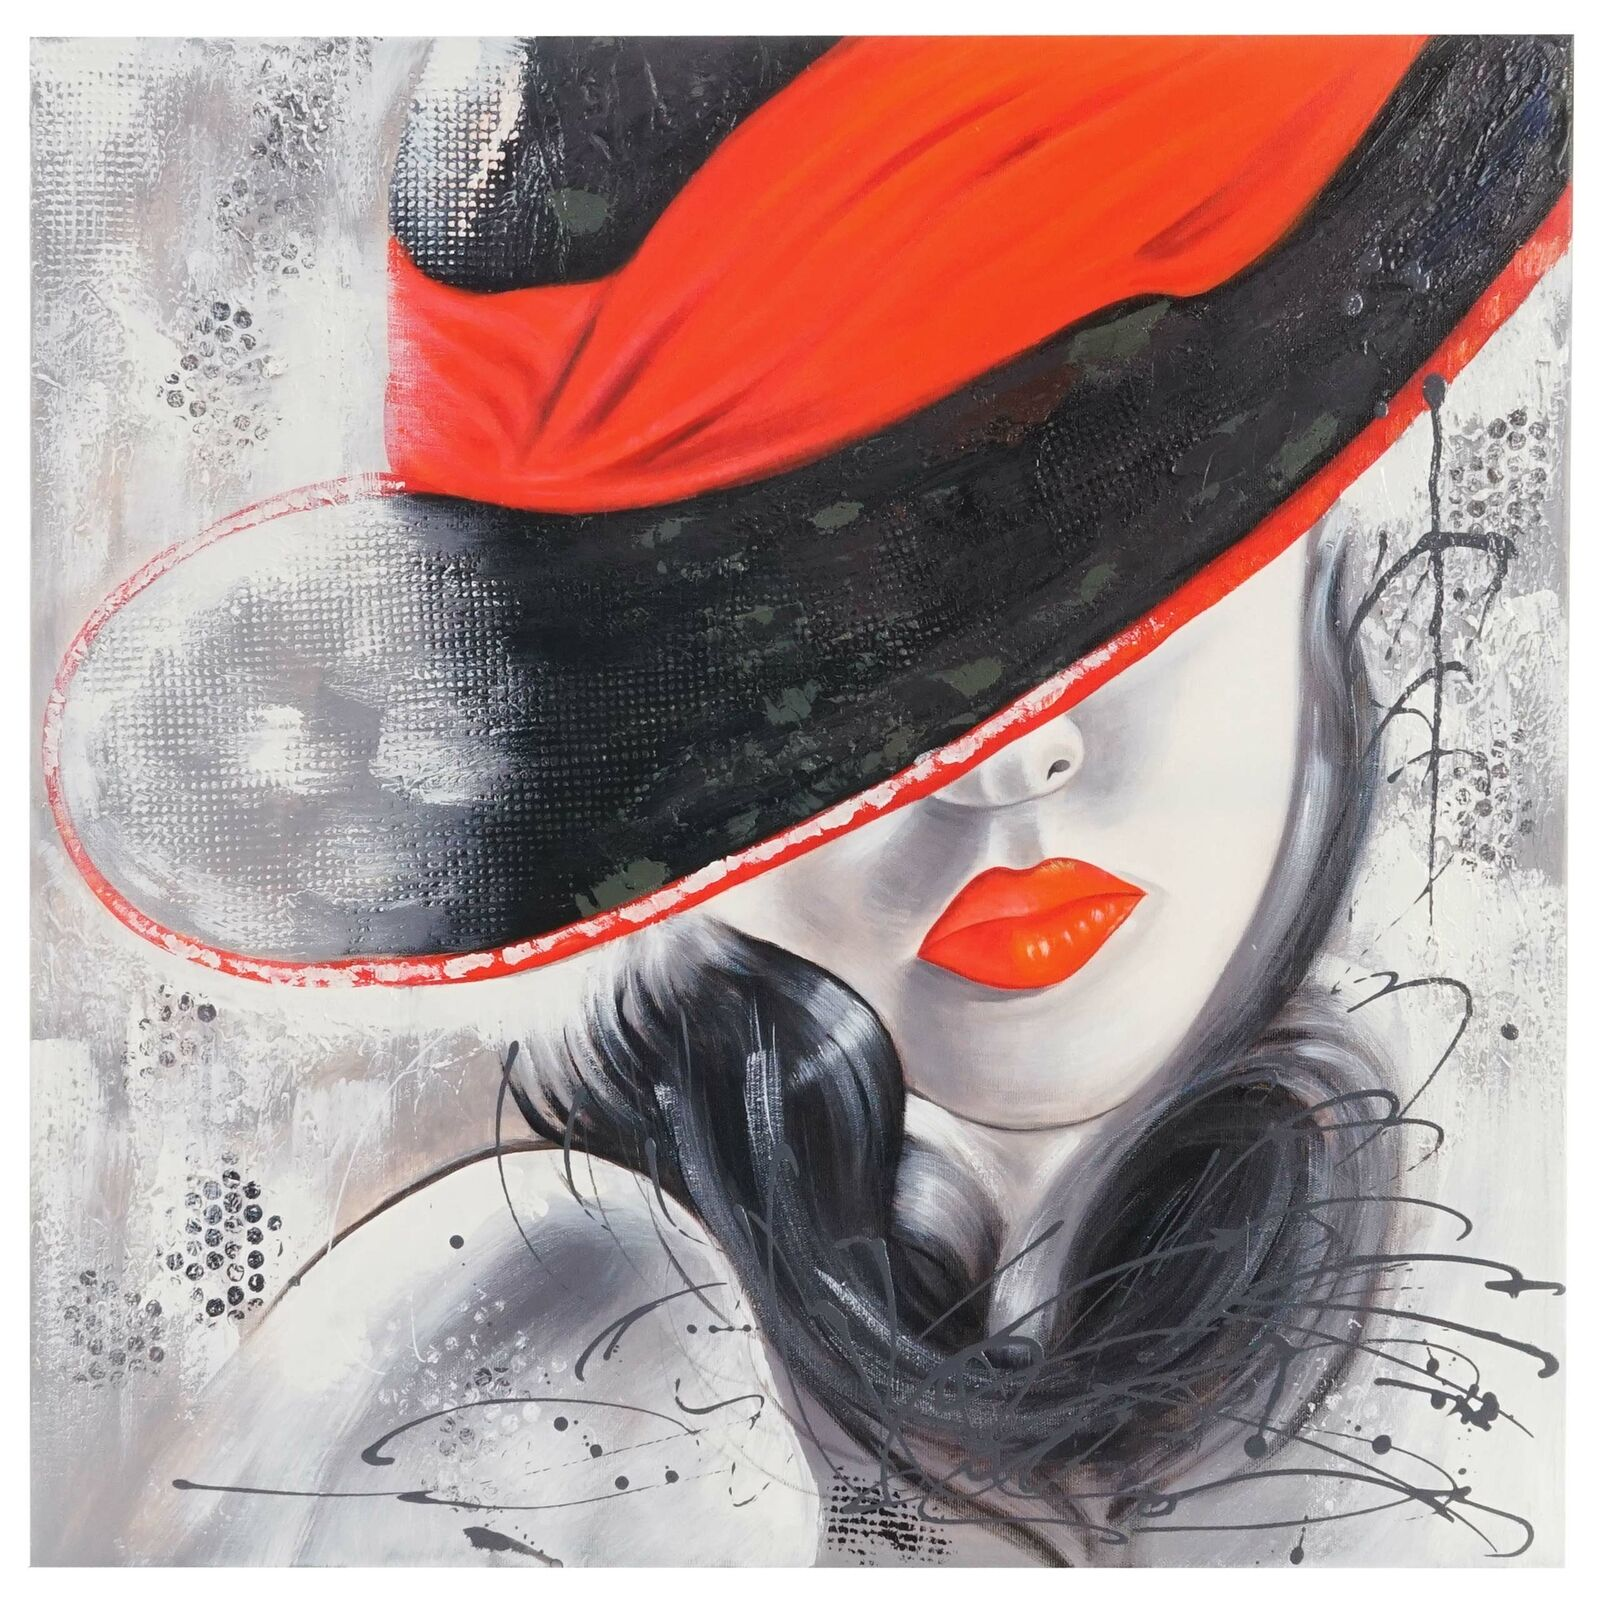 Cuadros oleos Lady, 100% parojo pintada imagen pinturas XL, 80x80cm